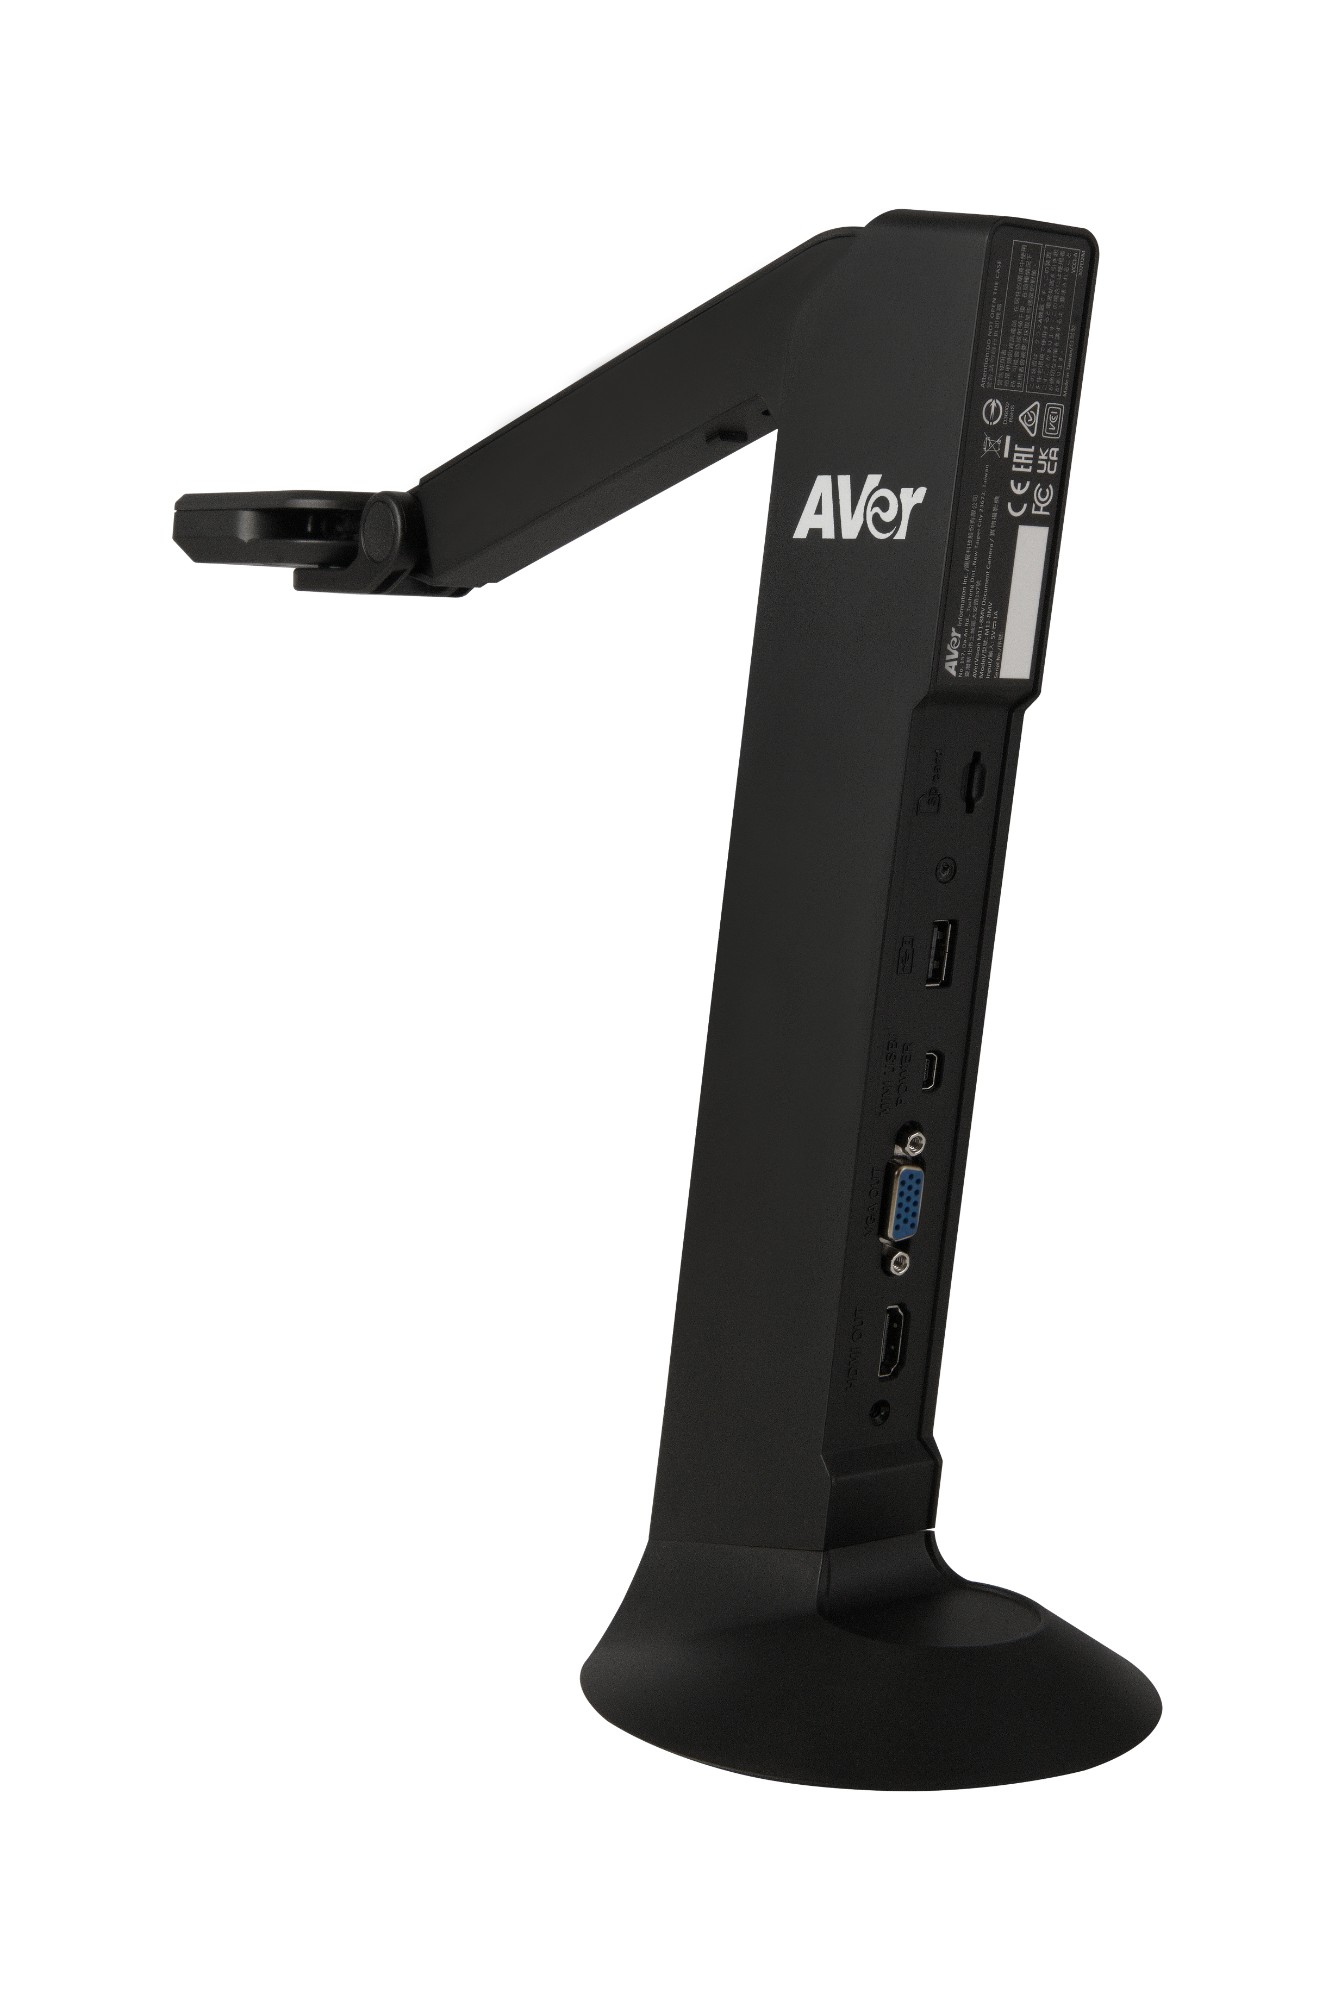 "AVer M11-8MV document camera Black 25.4 / 3.06 mm (1 / 3.06"") CMOS USB 2.0"